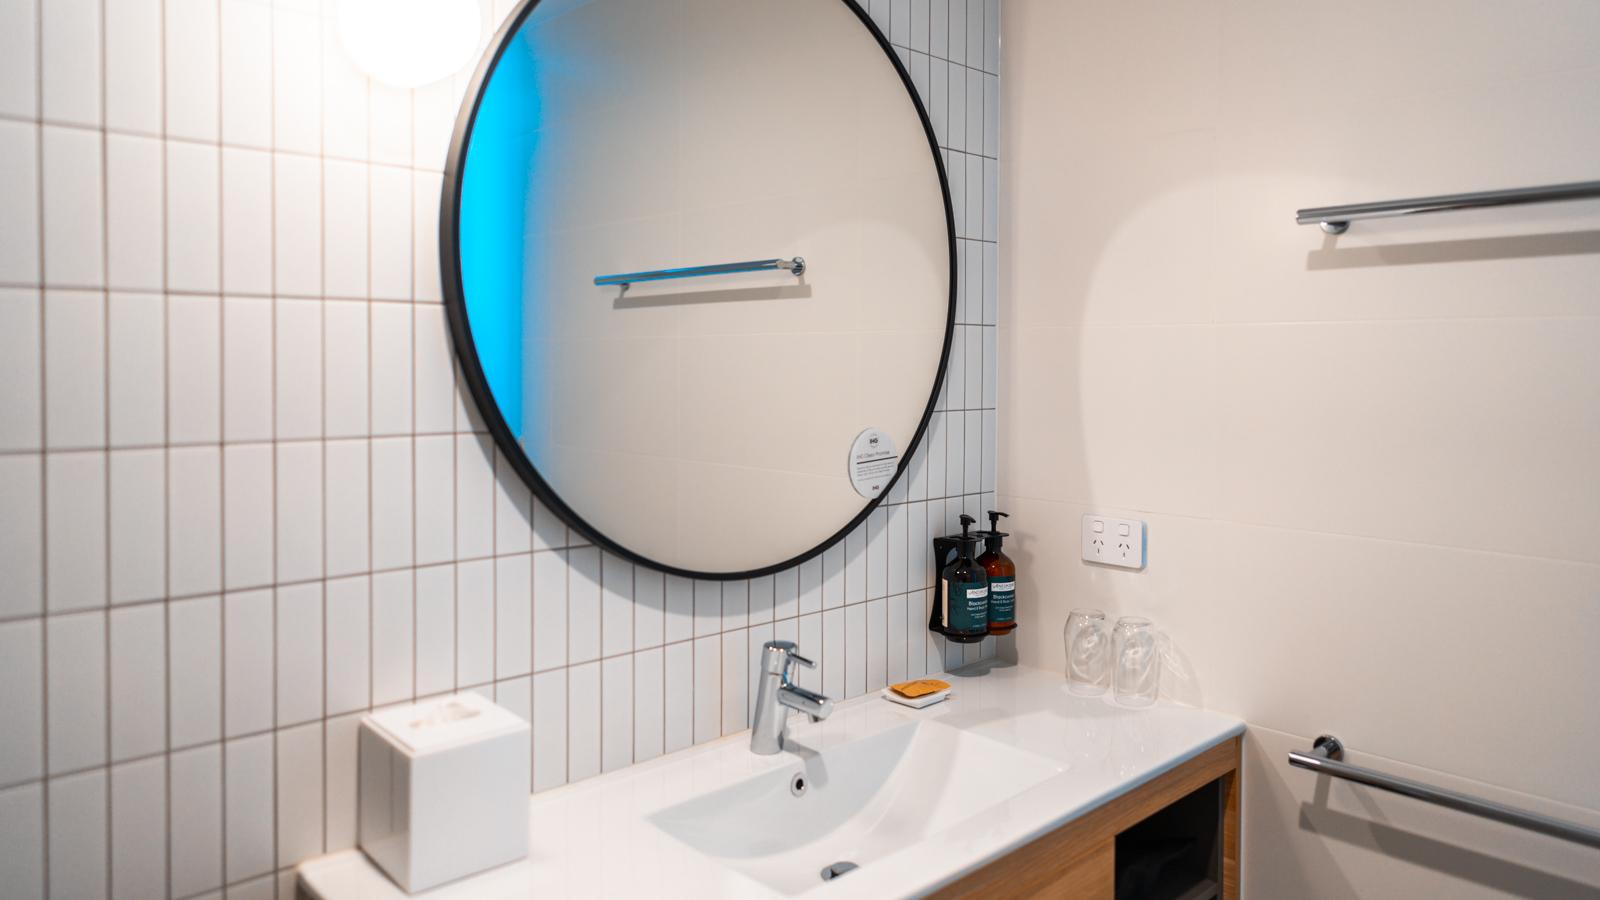 Crowne Plaza Adelaide bathroom